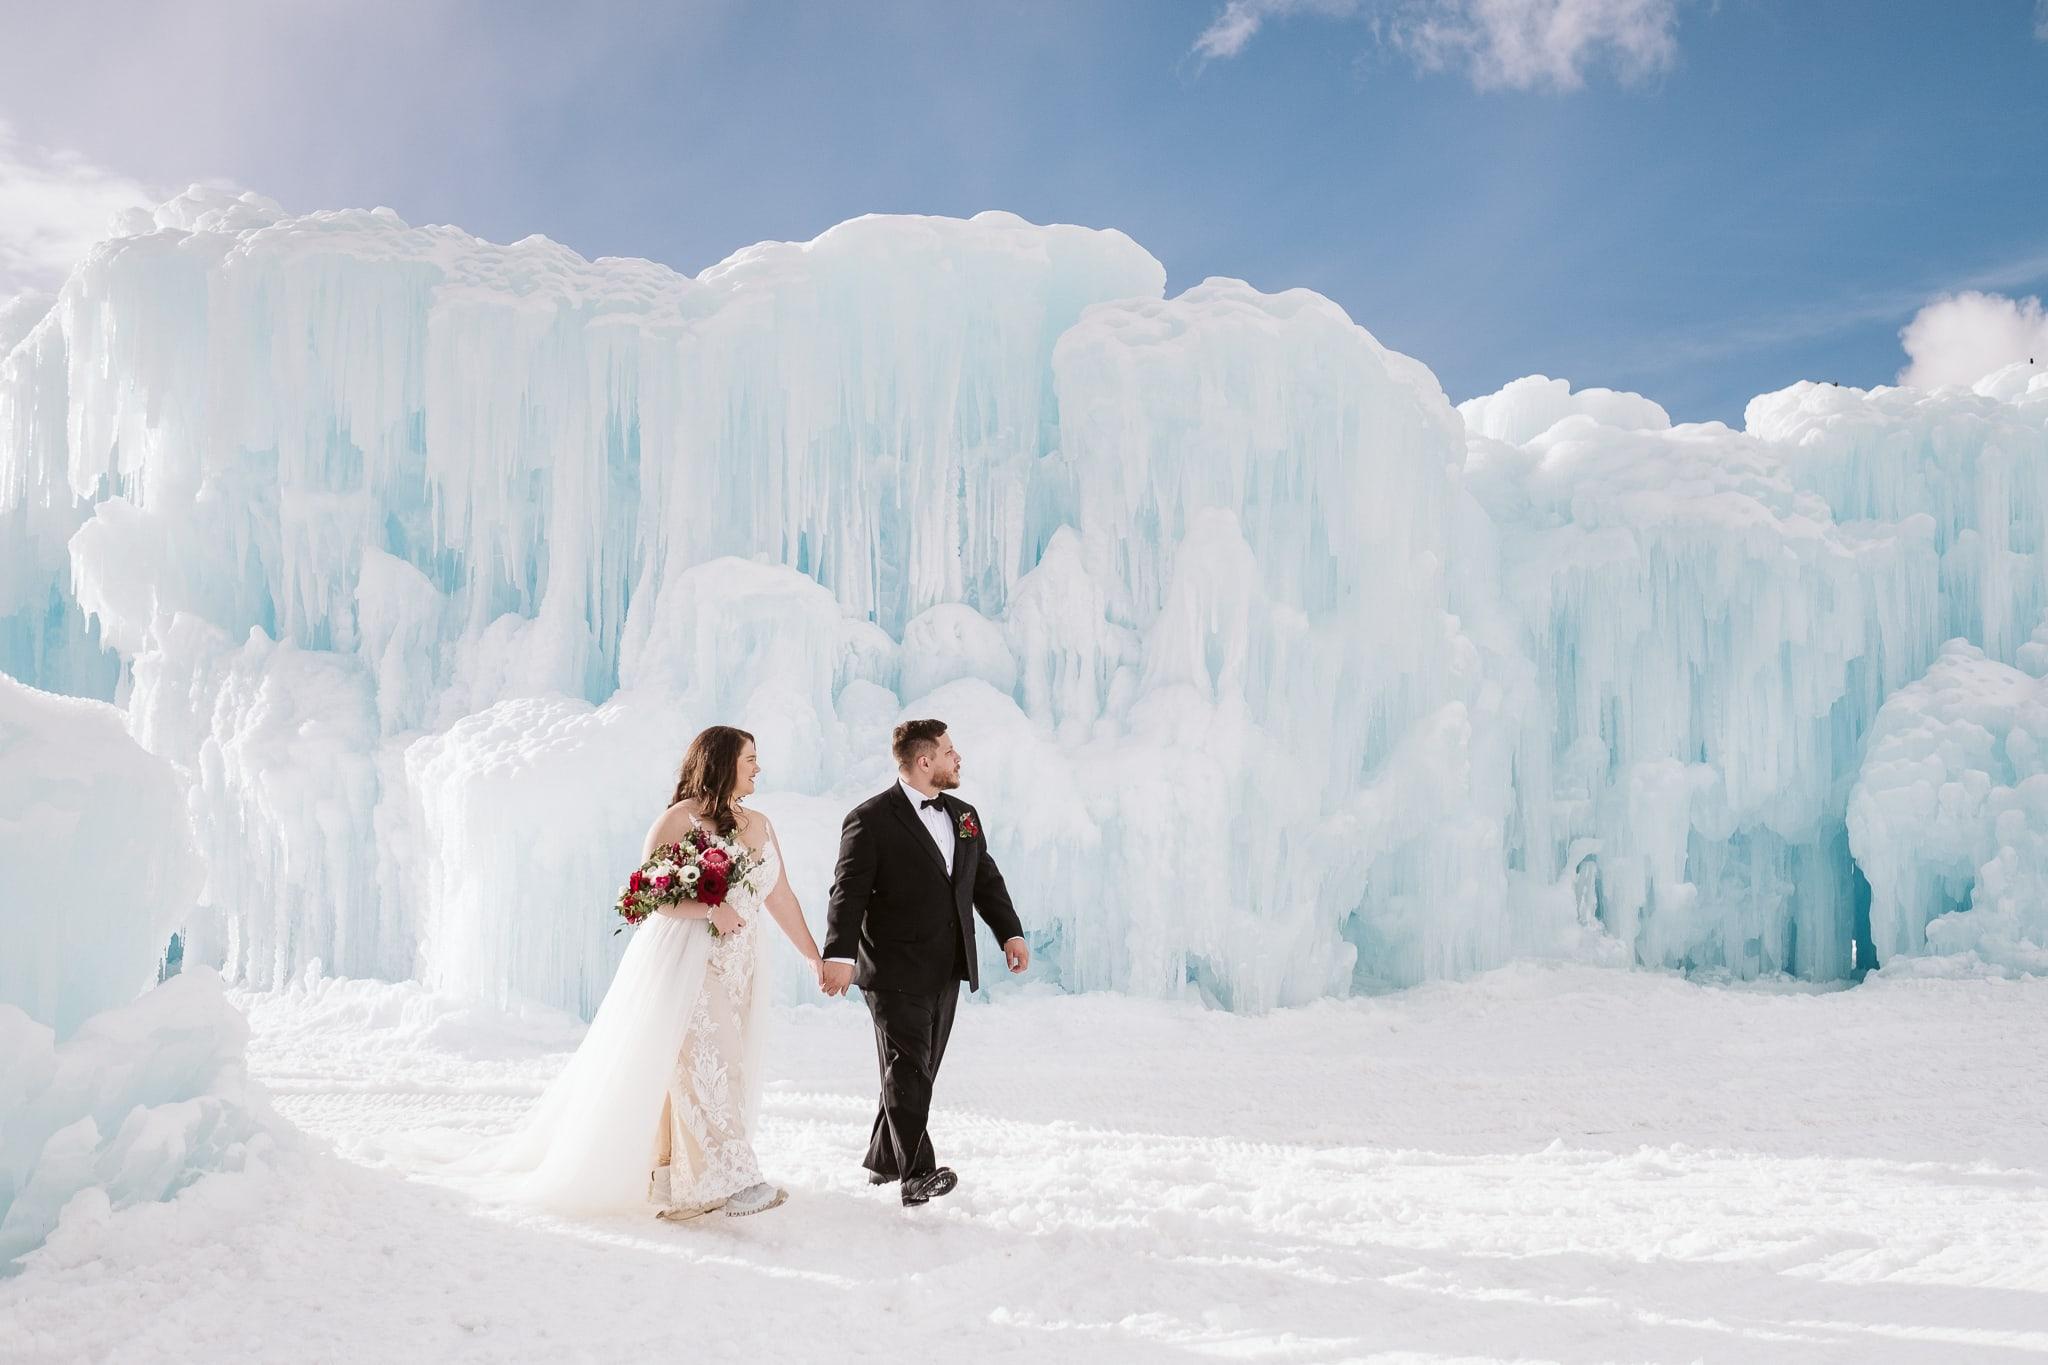 Winter elopement at Ice Castles in Colorado